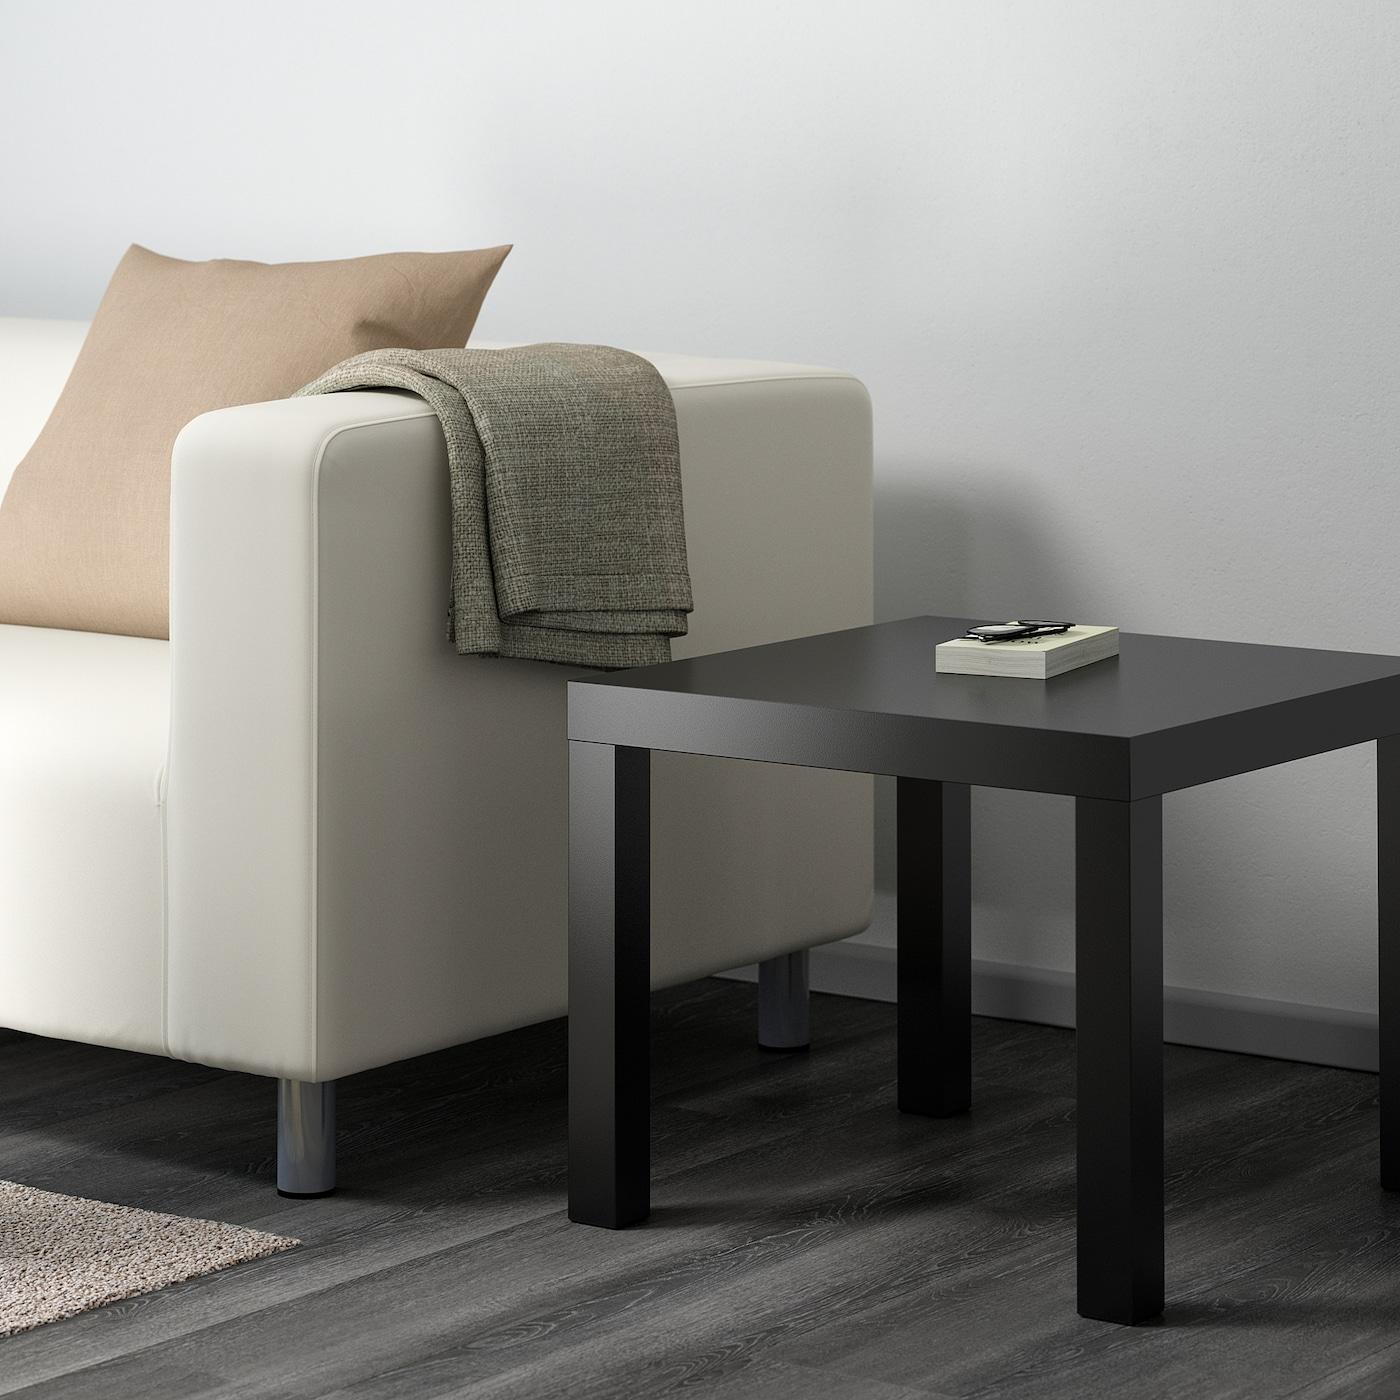 Lack Side Table Black 55x55 Cm Ikea [ 1400 x 1400 Pixel ]